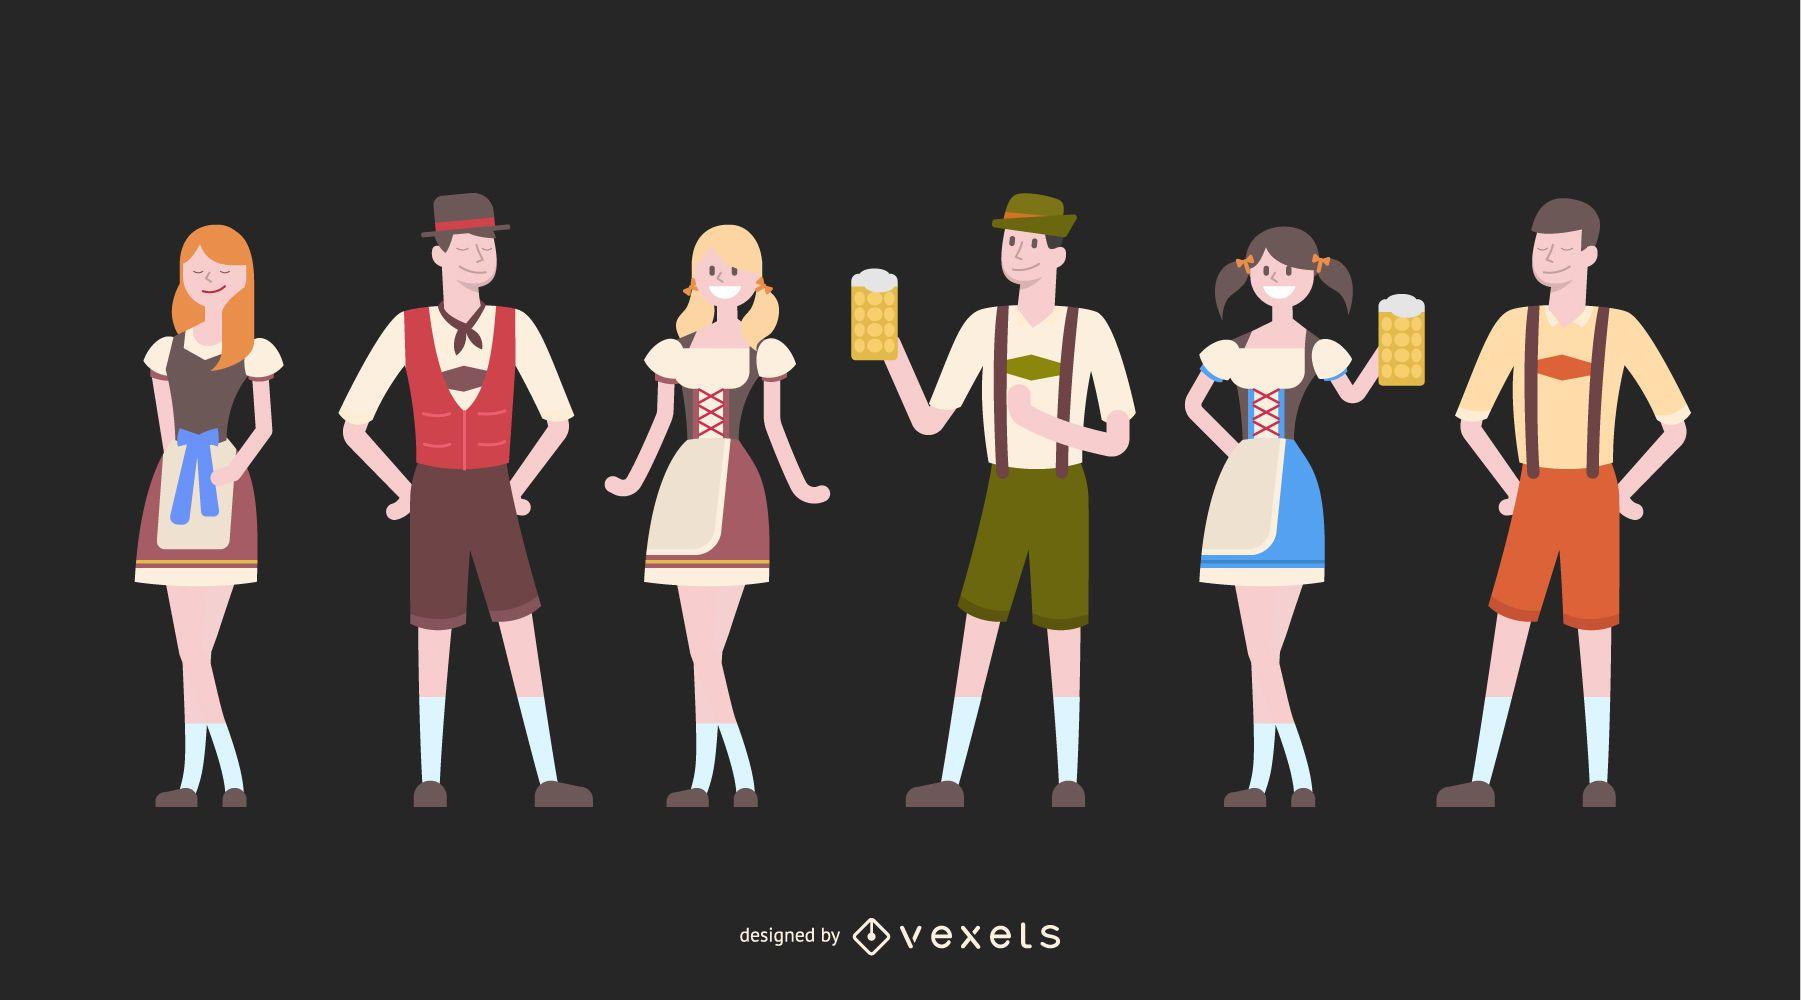 Oktoberfest characters illustration set